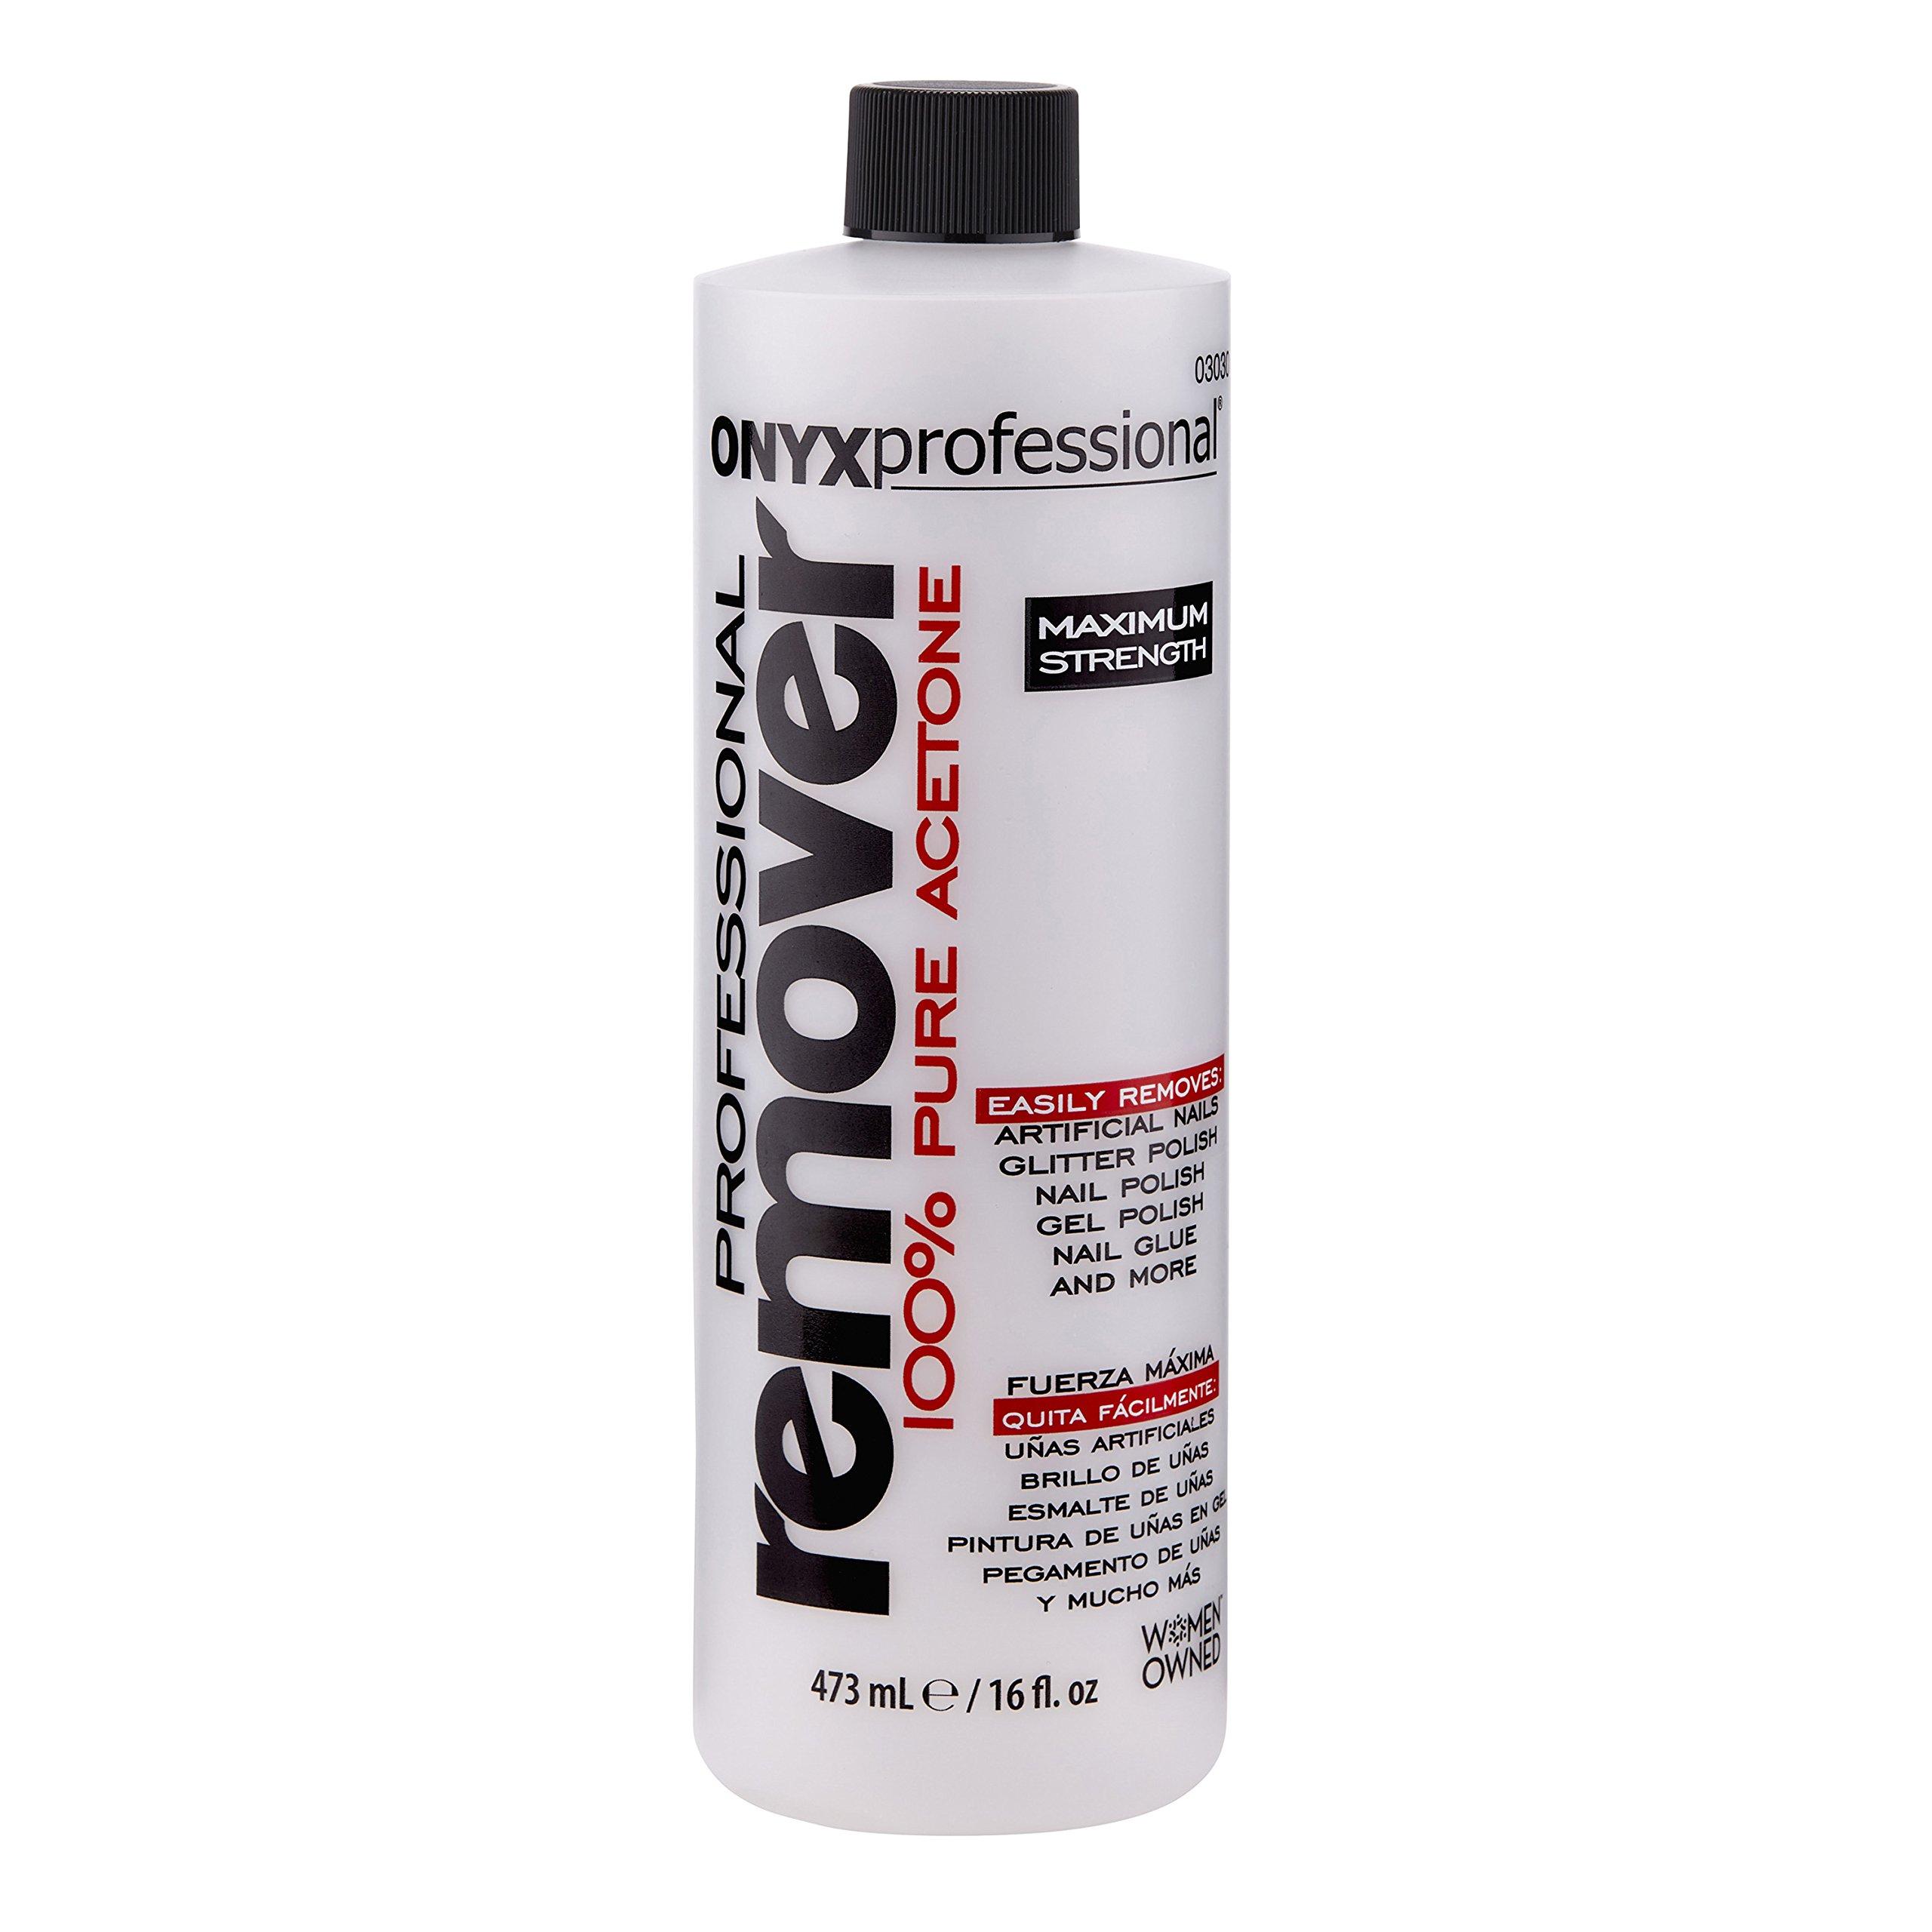 Acetone Nail Polish Remover 16oz - Removes All Nail Polishes